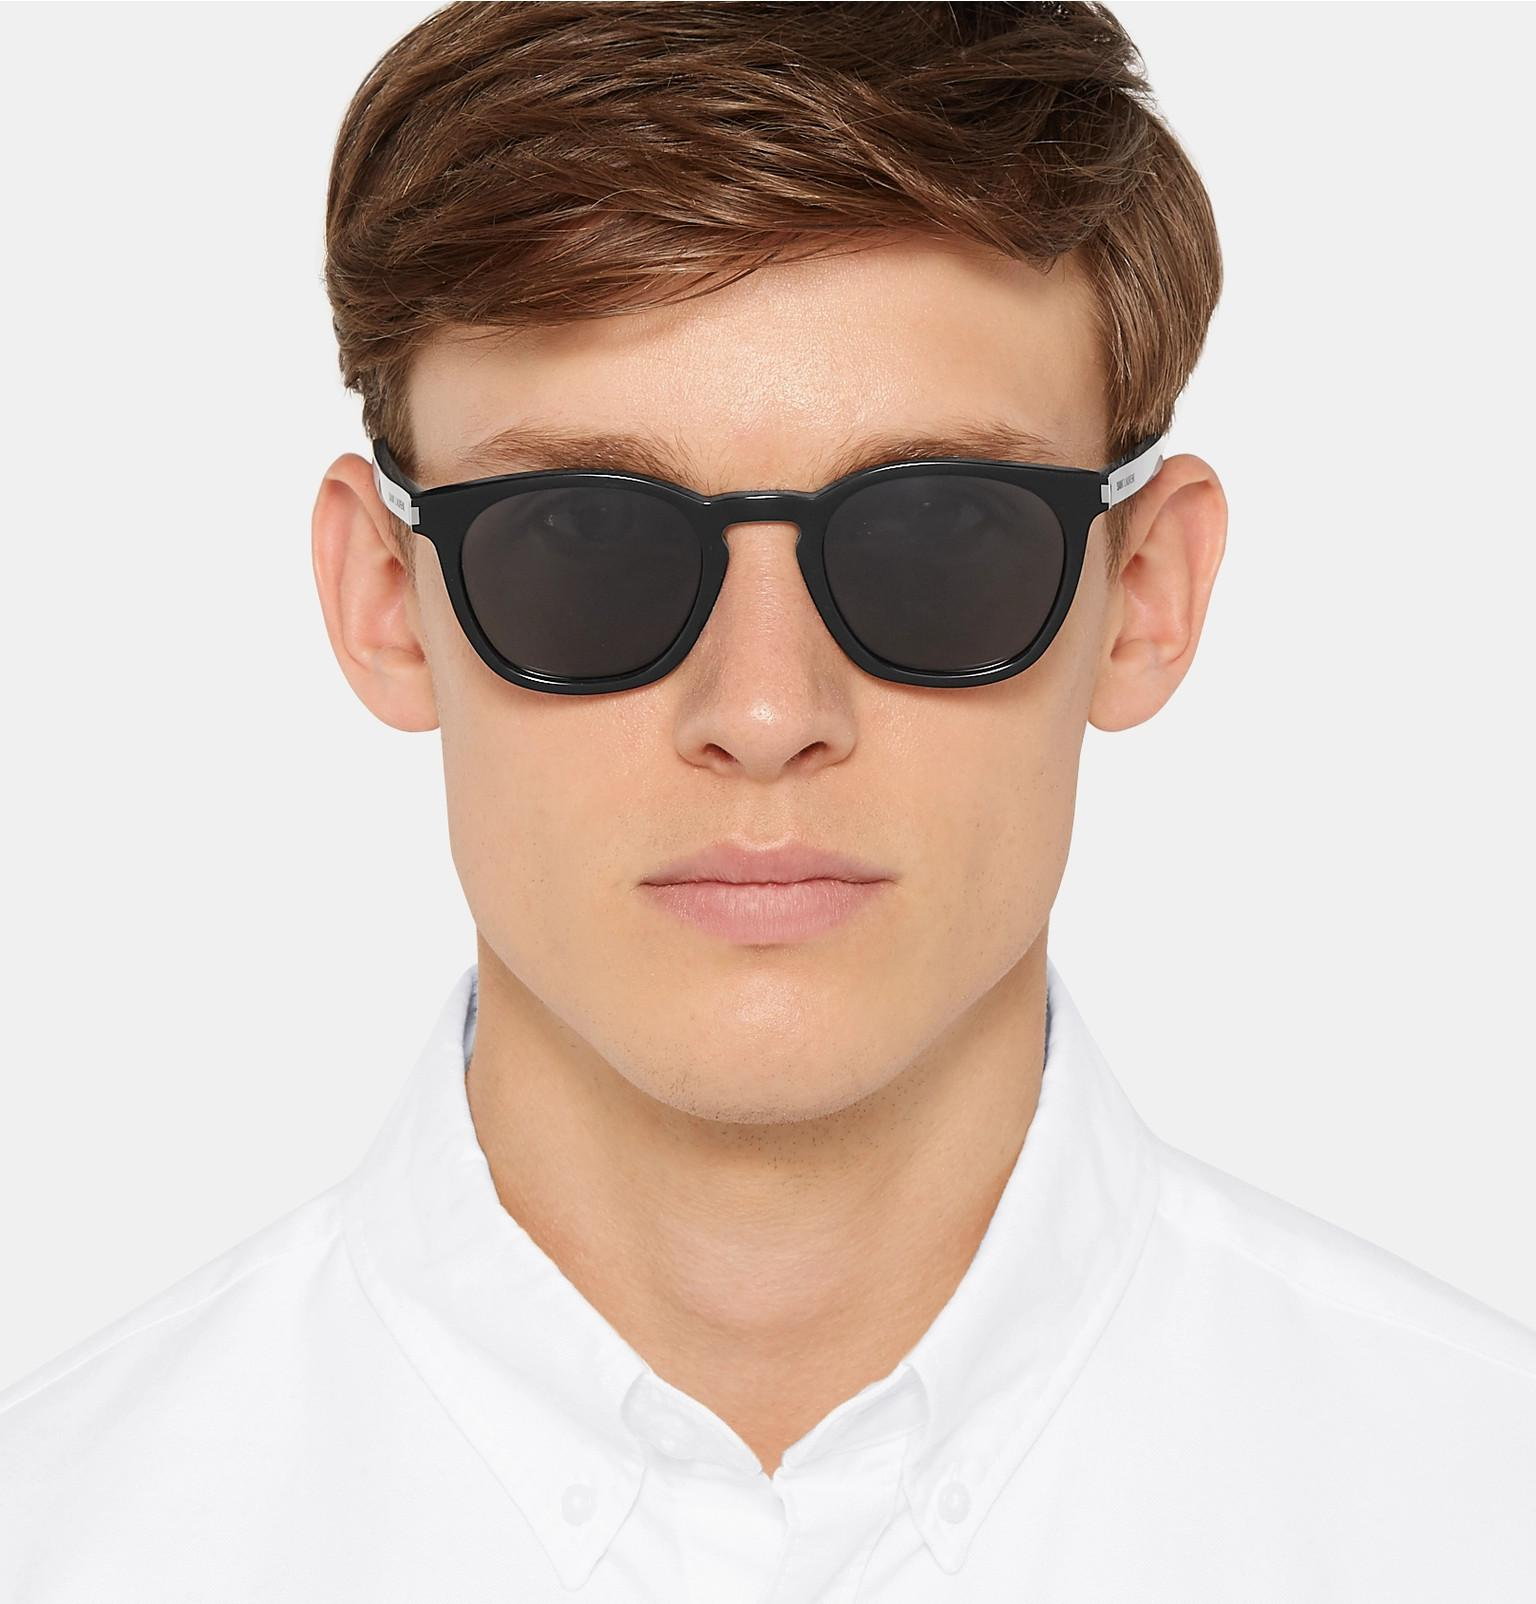 8a075843dcd6 Saint Laurent - Black D-frame Acetate Sunglasses for Men - Lyst. View  fullscreen